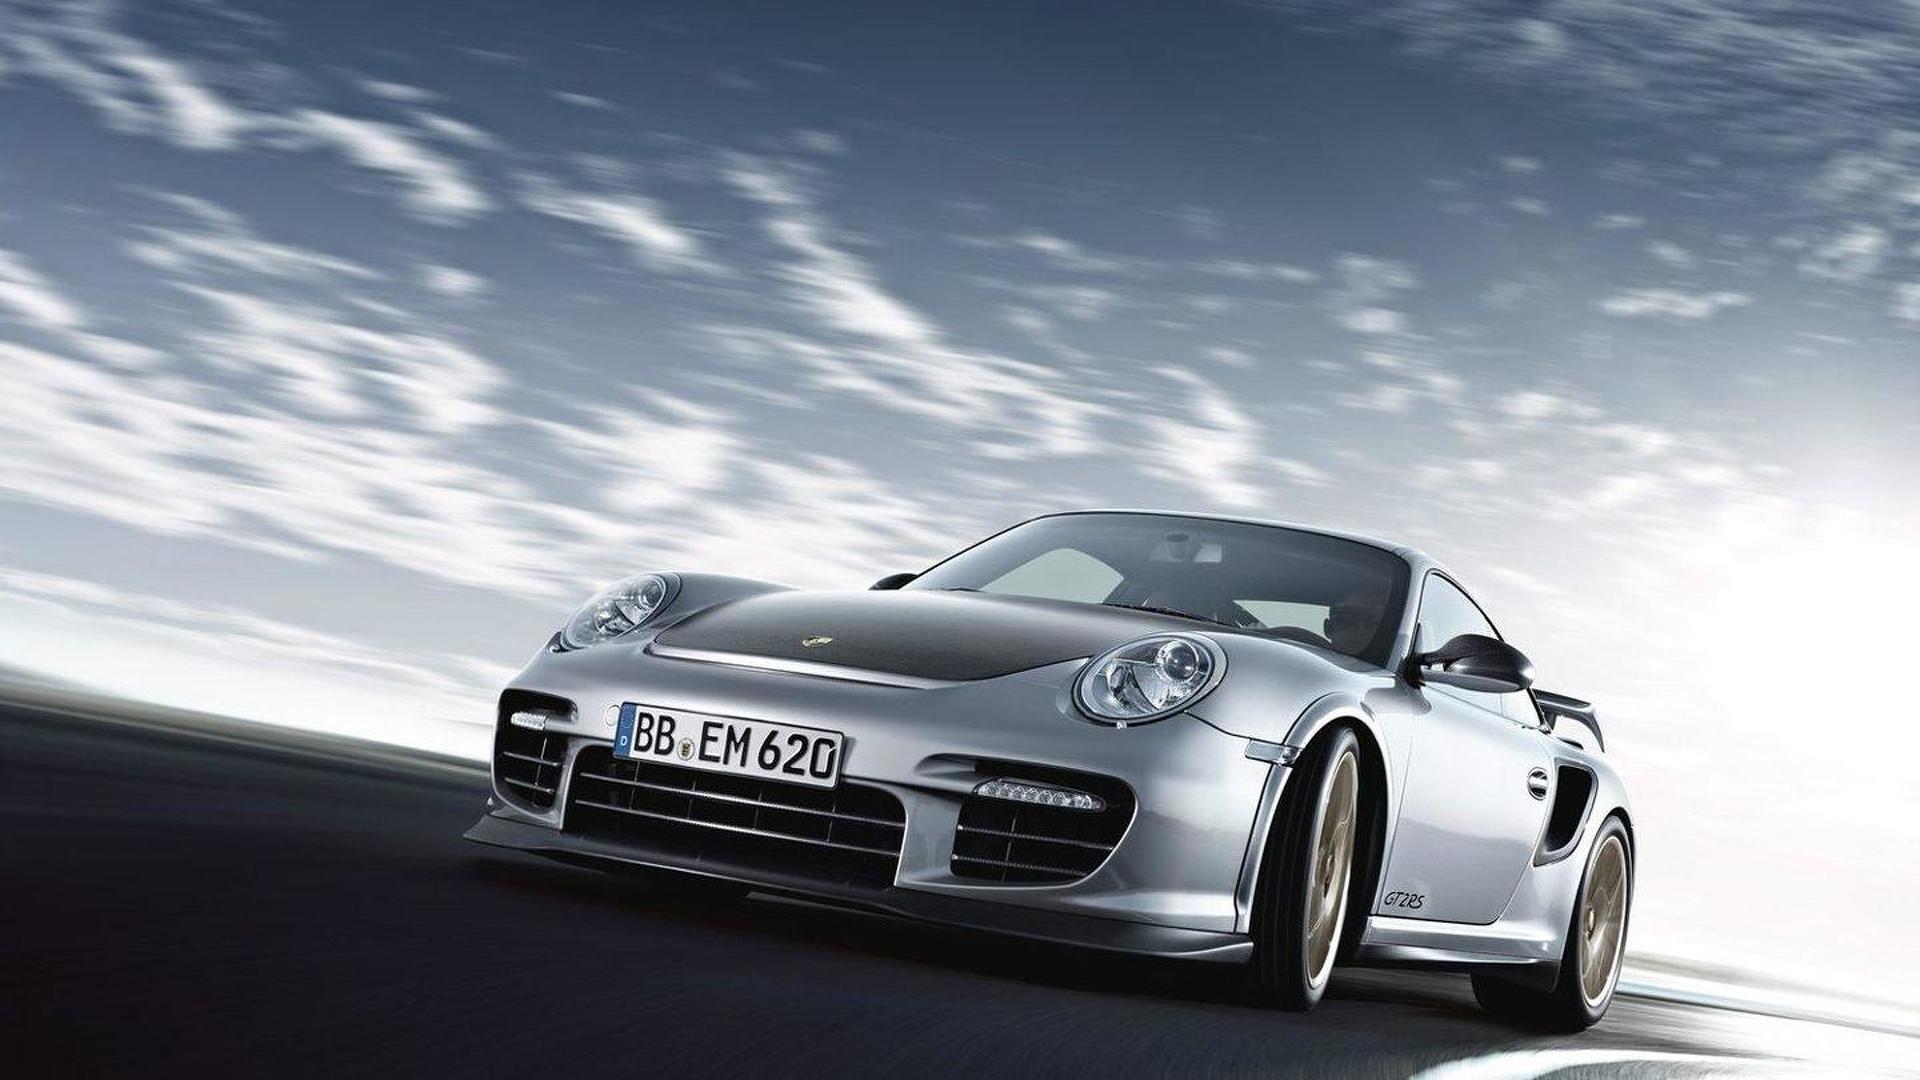 2010-253313-2011-porsche-911-gt2-rs-first-official-photos-12-05-20101 Astounding Porsche 911 Gt2 for Sale Canada Cars Trend